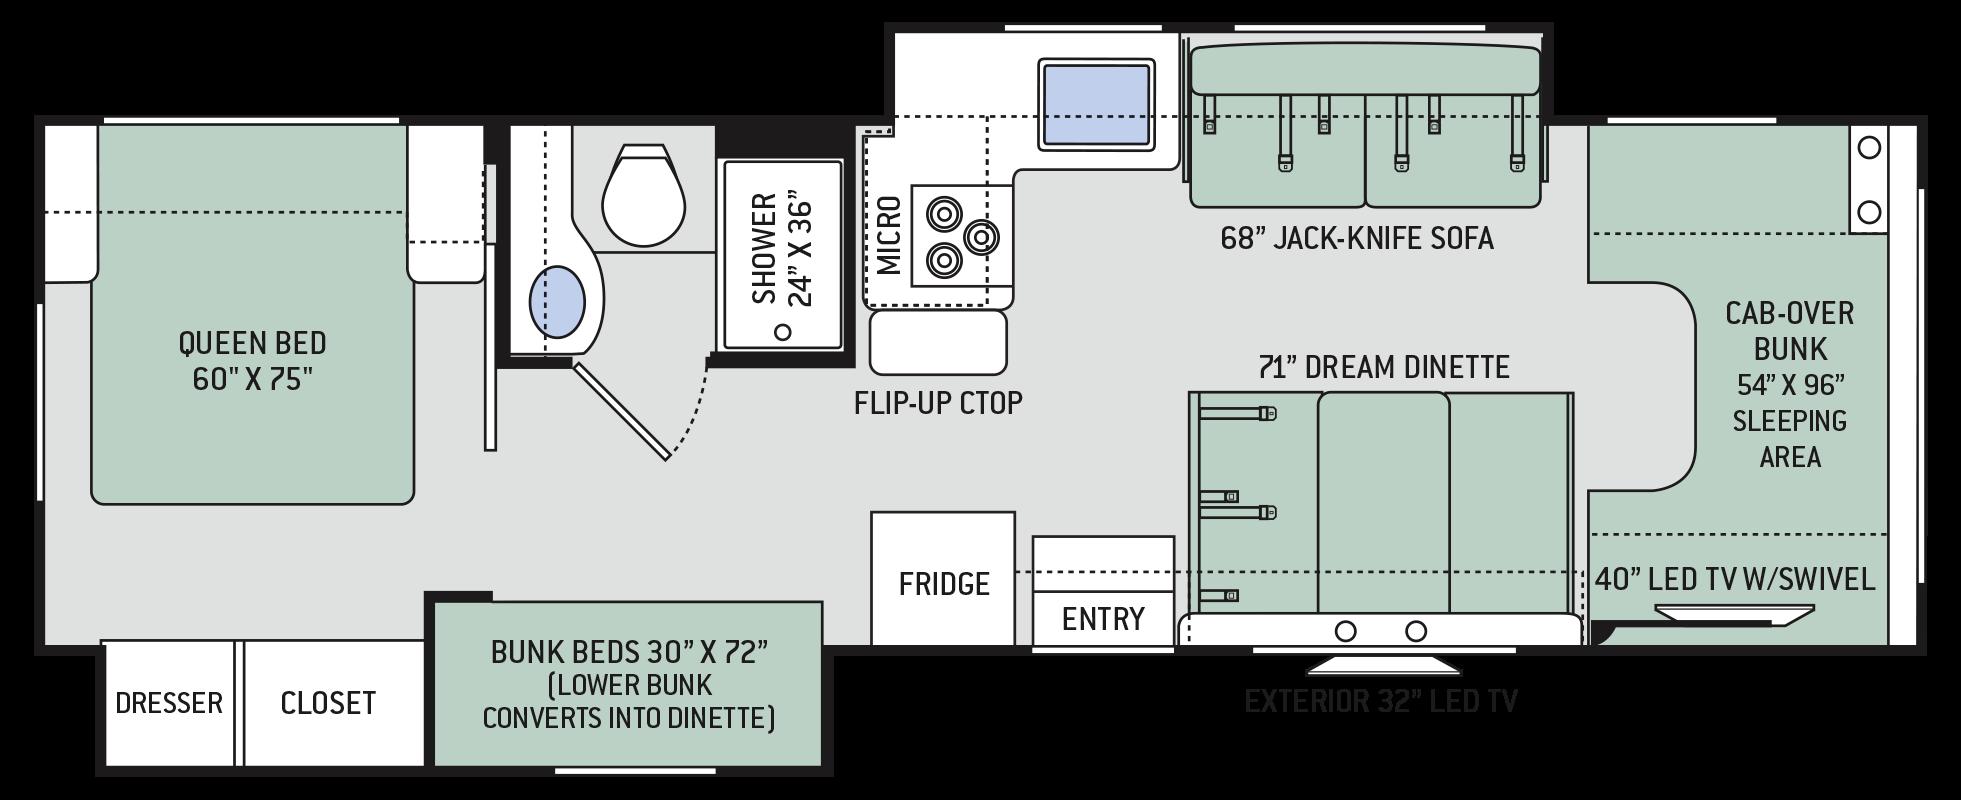 Freedom Elite Class C Motorhomes Floor Plan 30fe Thor